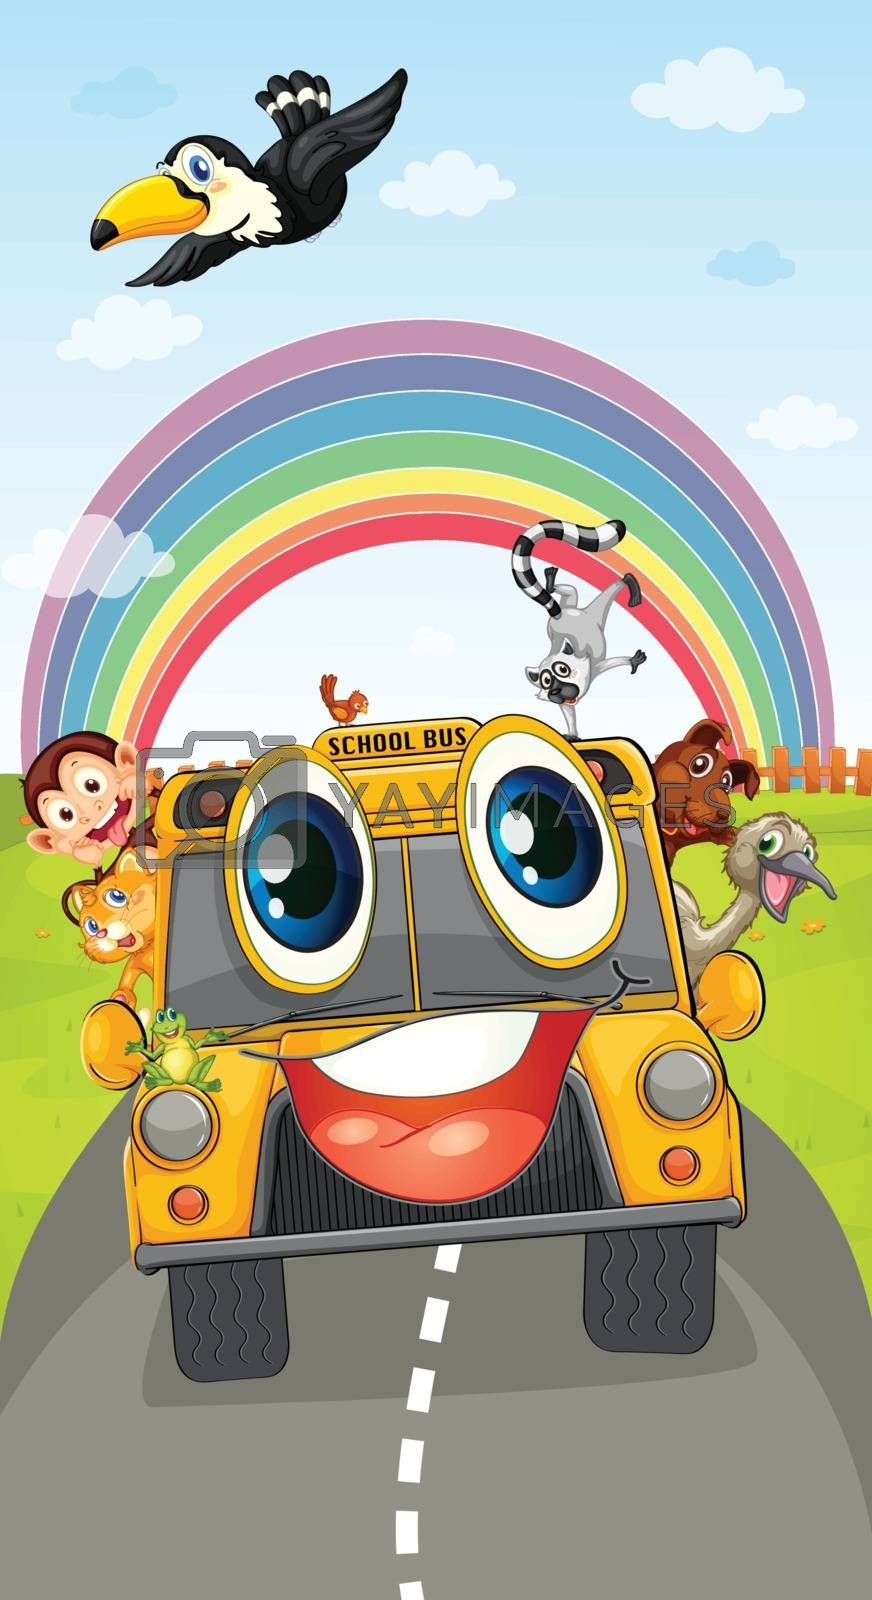 illustration of various animals in school bus